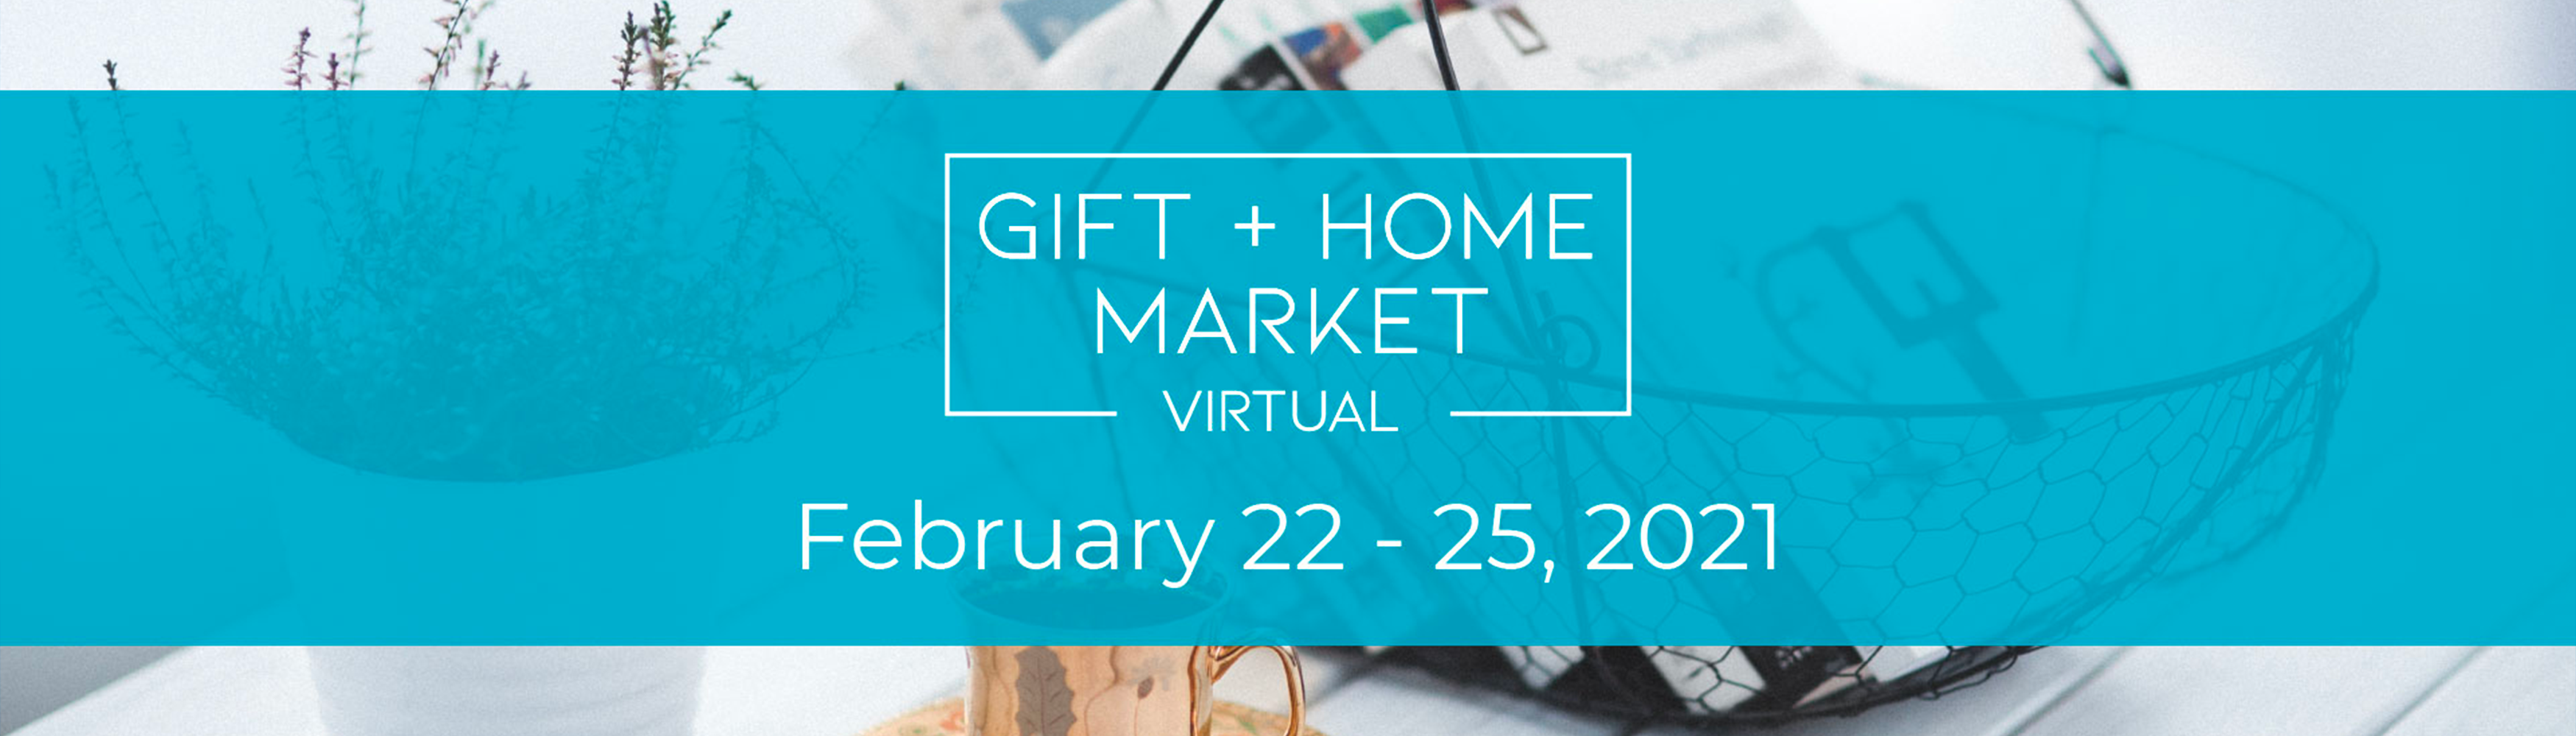 WebSite-GiftHomeMarket